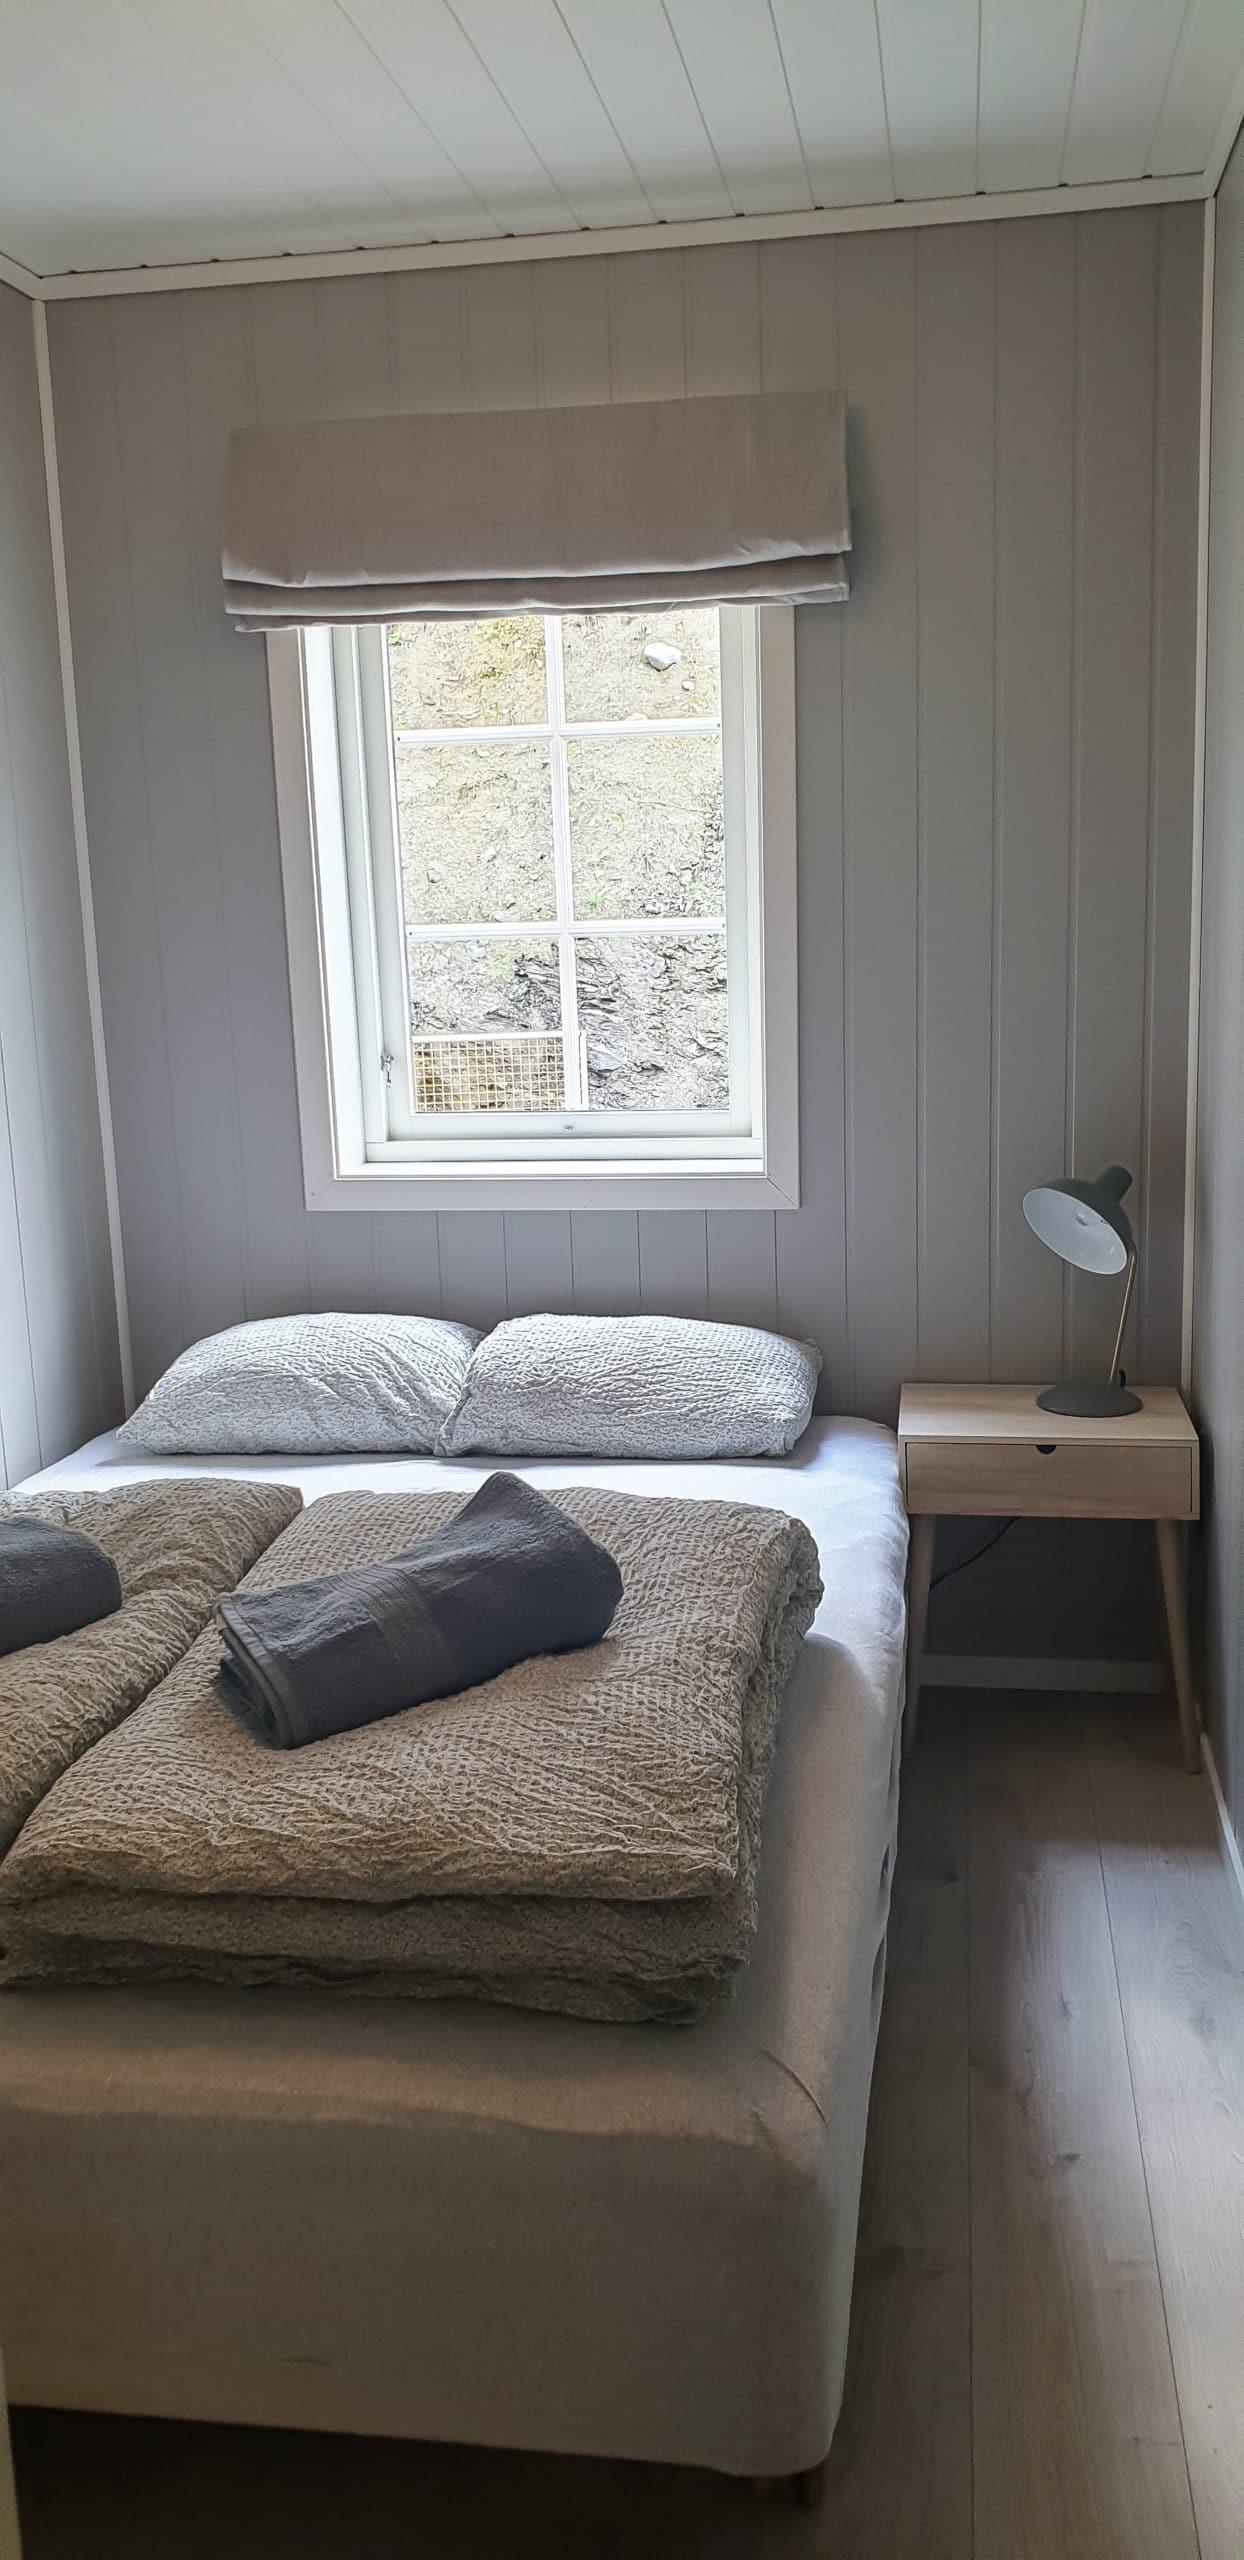 SanSelcabin Bedroom1